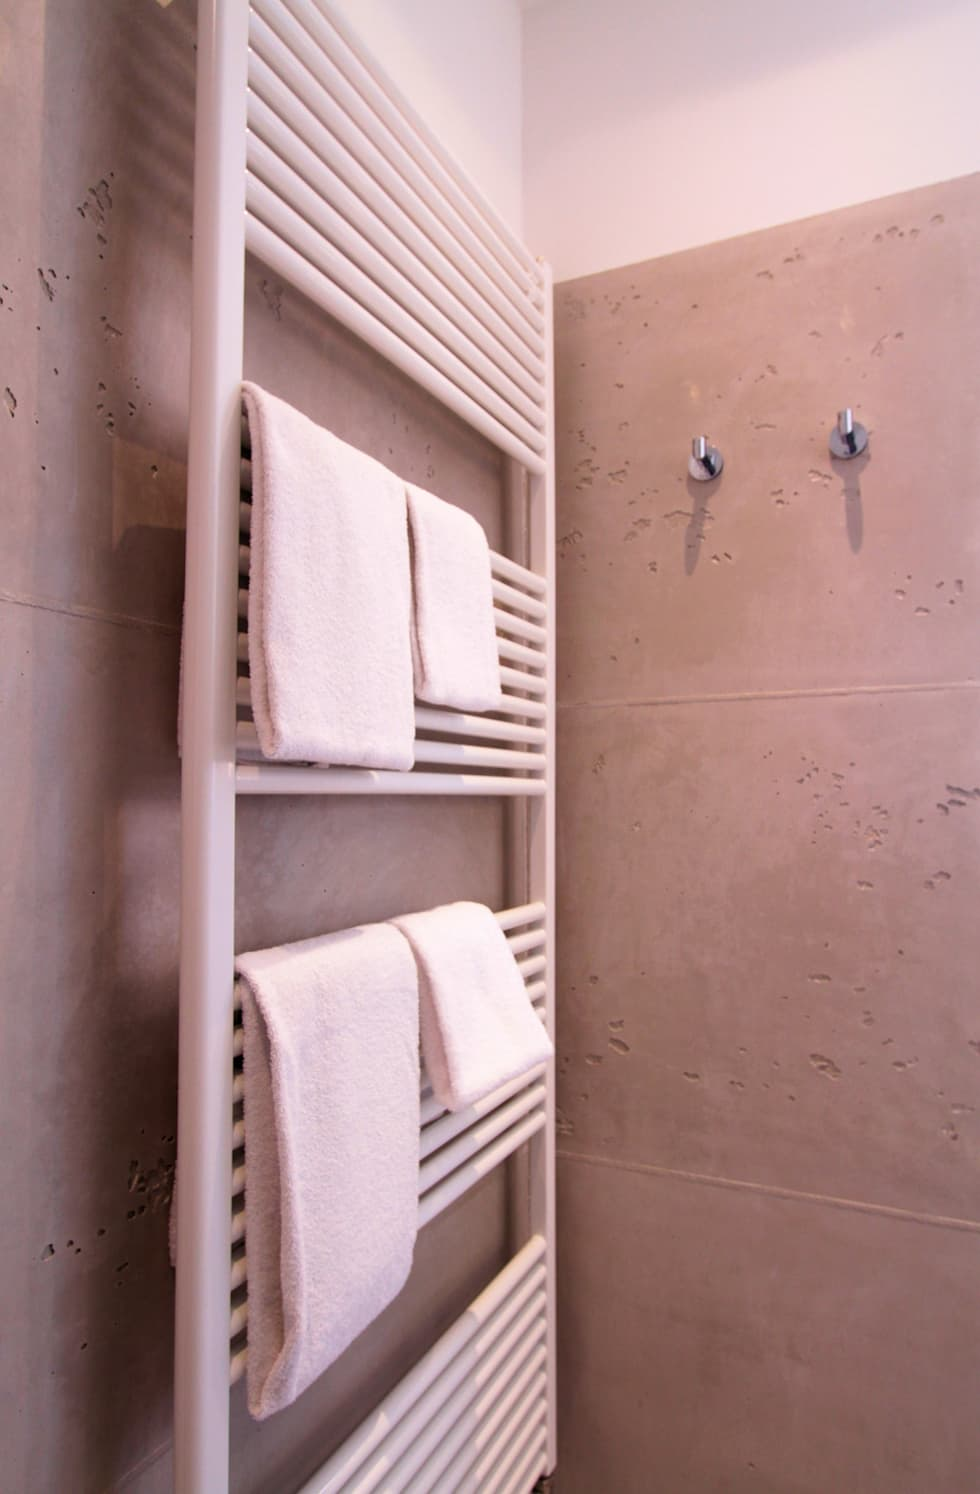 interior design ideas redecorating remodeling photos. Black Bedroom Furniture Sets. Home Design Ideas